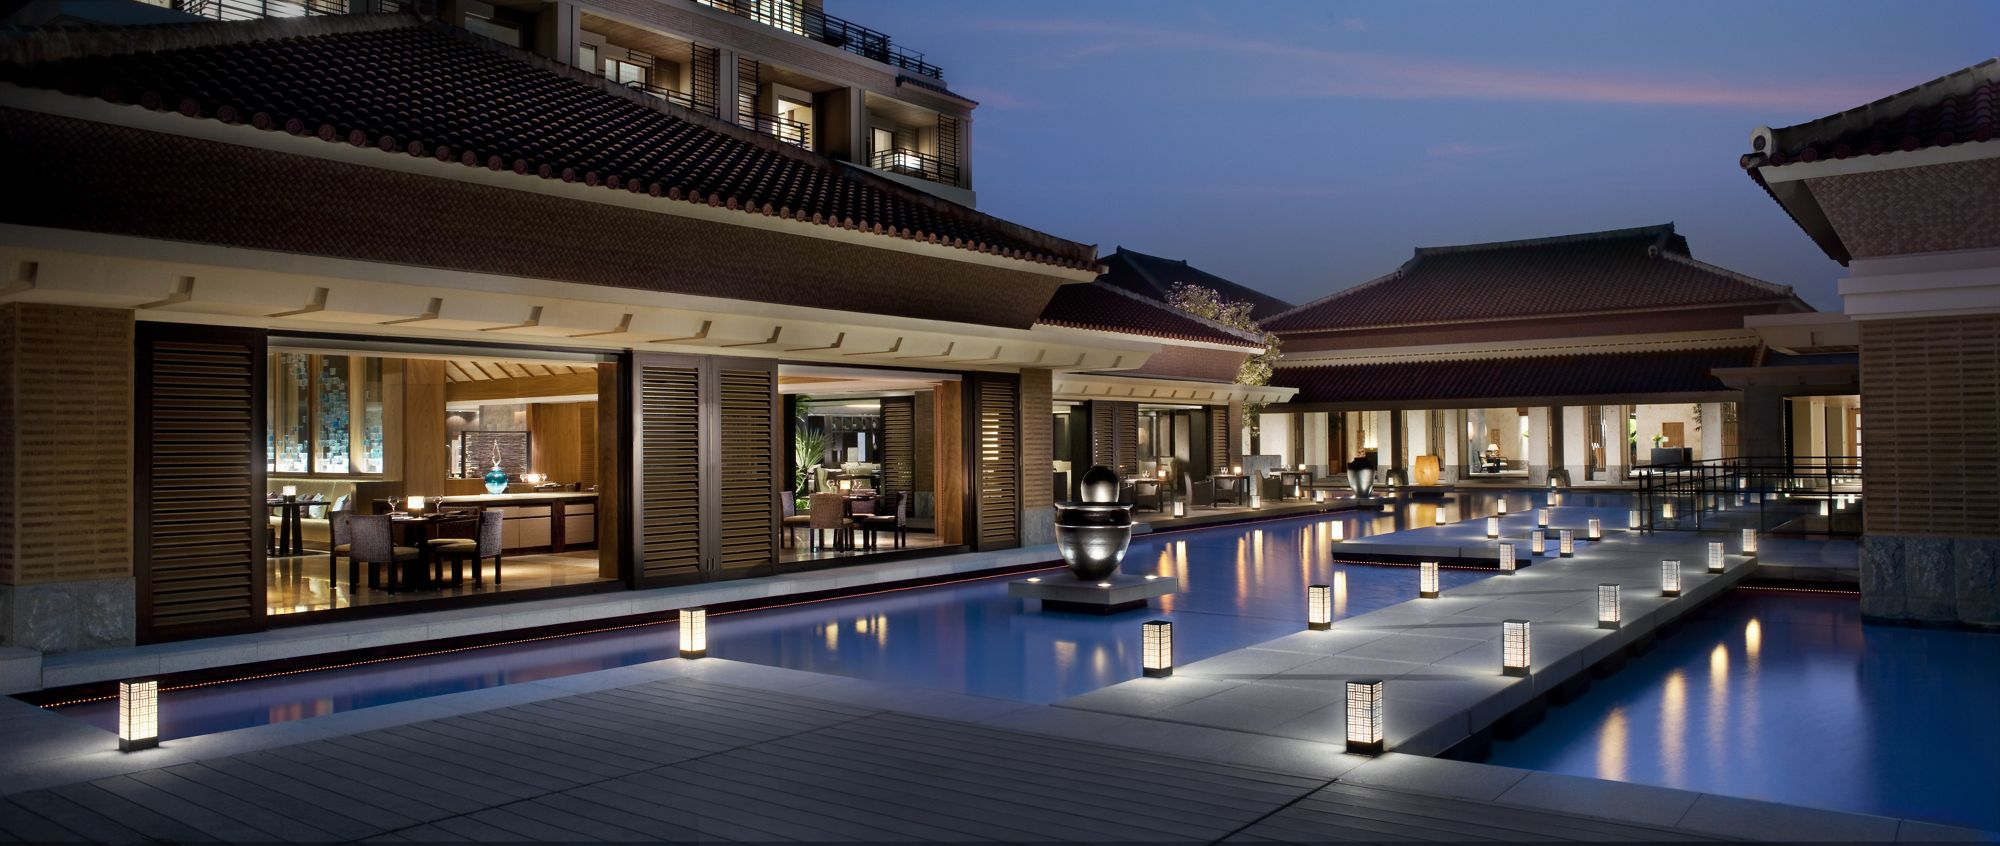 Ritz-Carlton Okinawa